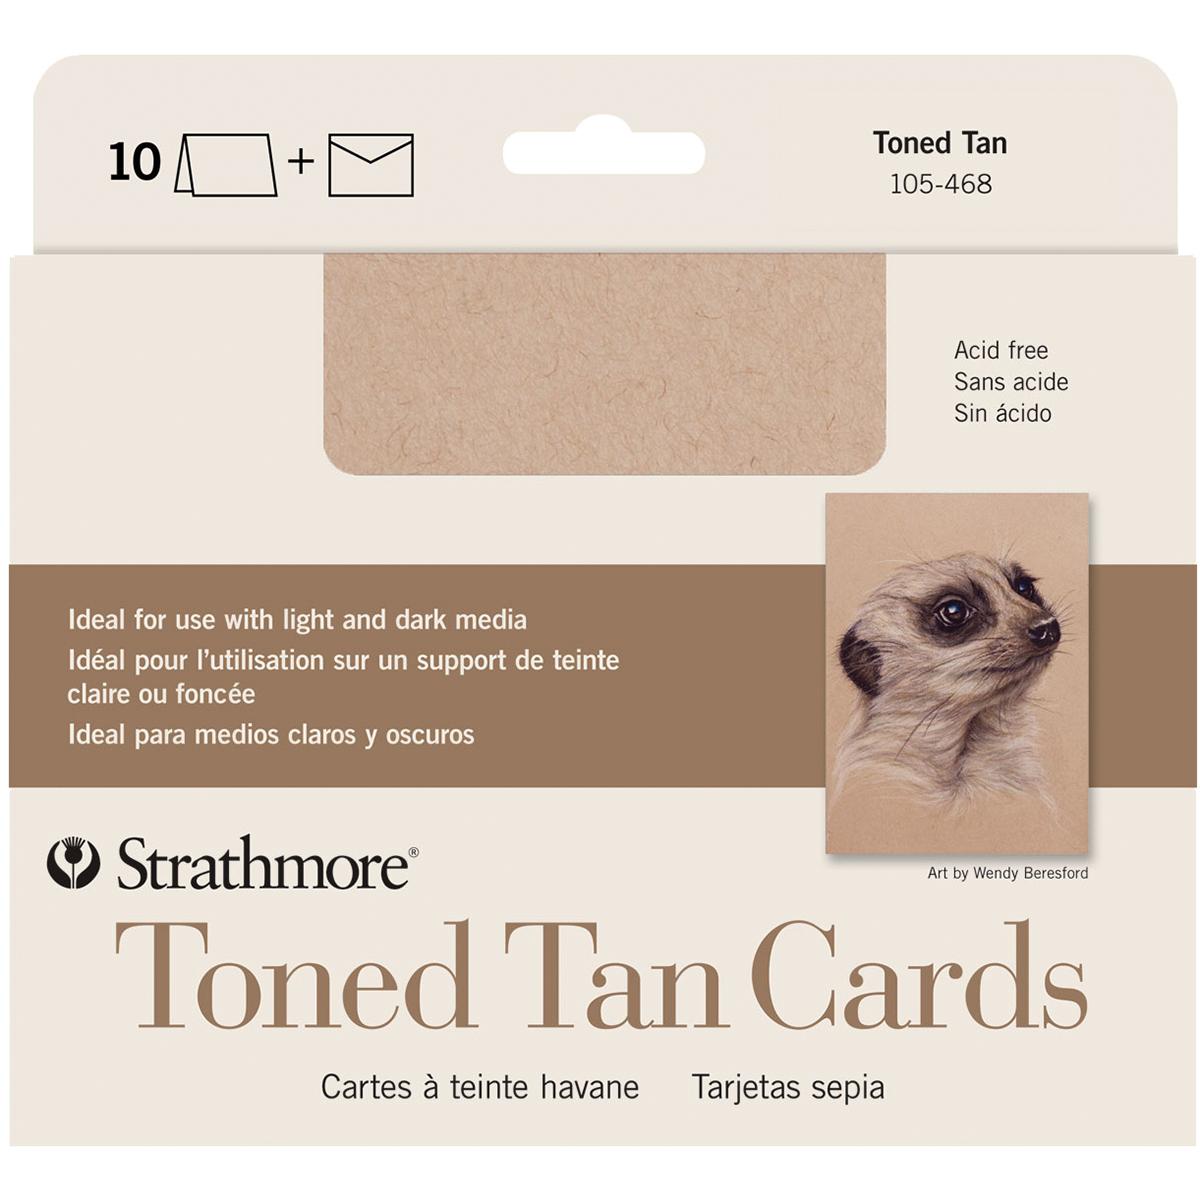 Strathmore Toned Tan Cards & Envelopes